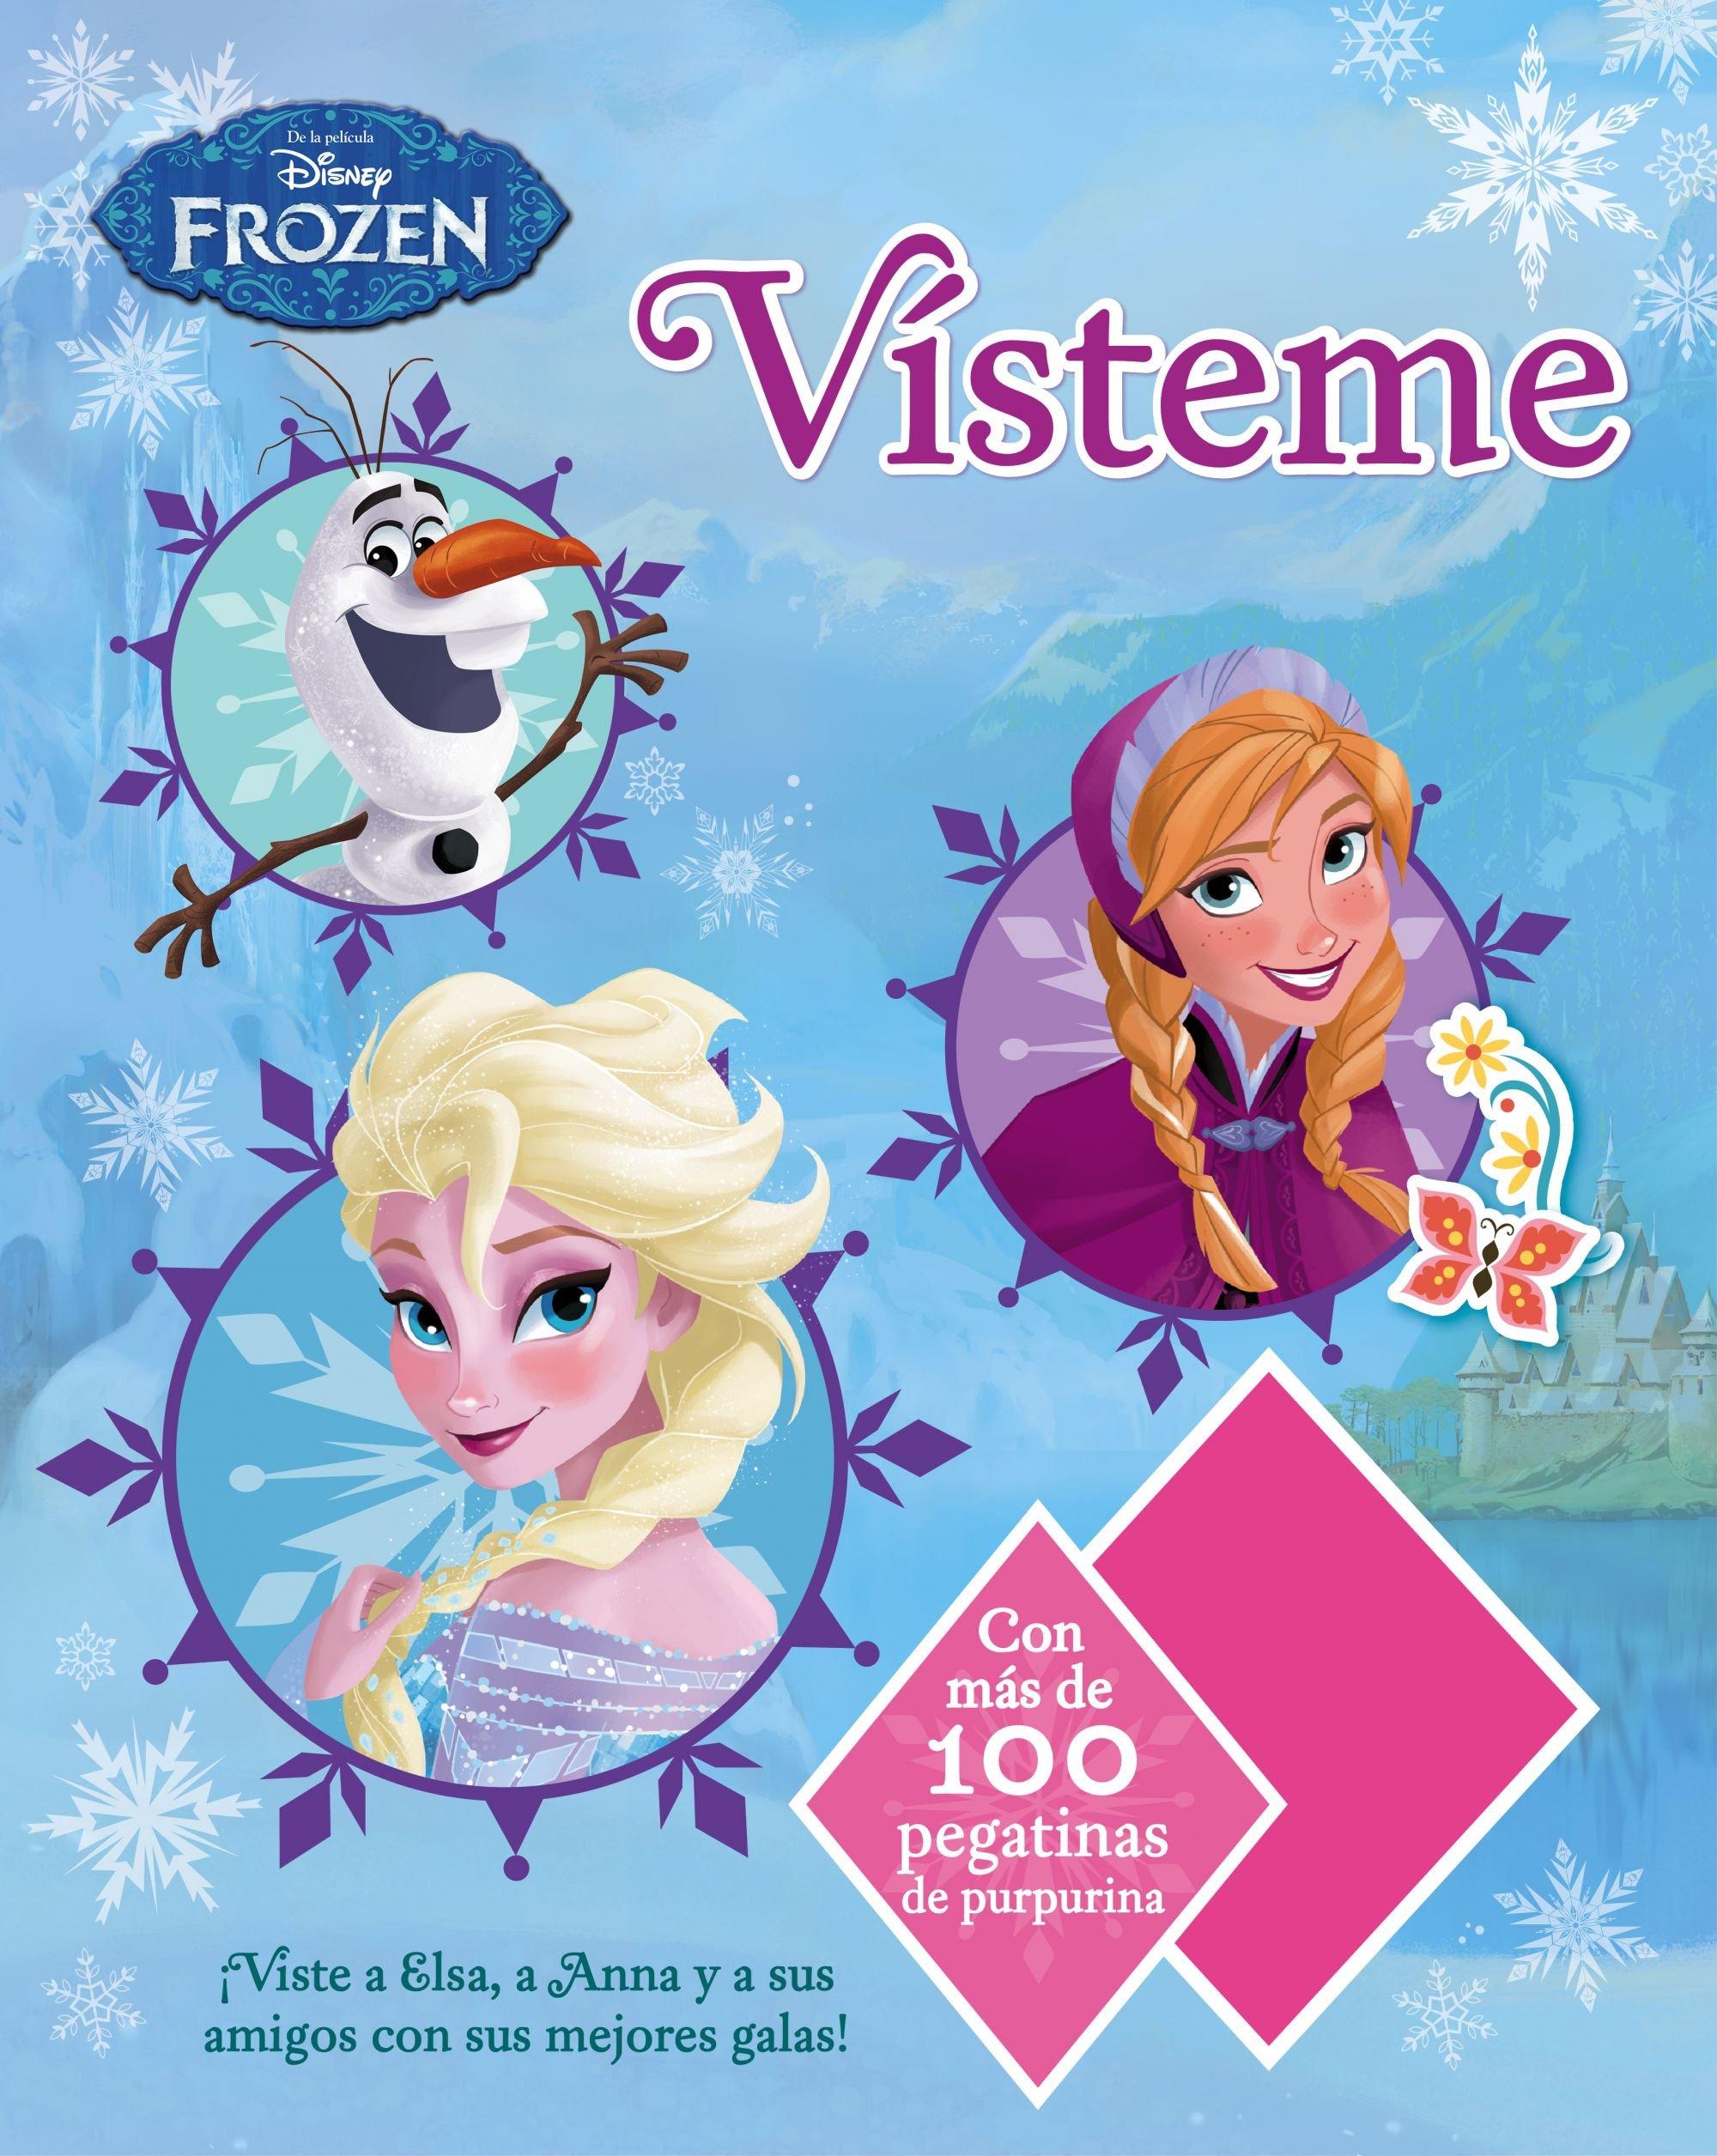 Frozen. Vísteme: Con más de 100 pegatinas con purpurina Disney. Frozen: Amazon.es: Disney, Editorial Planeta S. A.: Libros